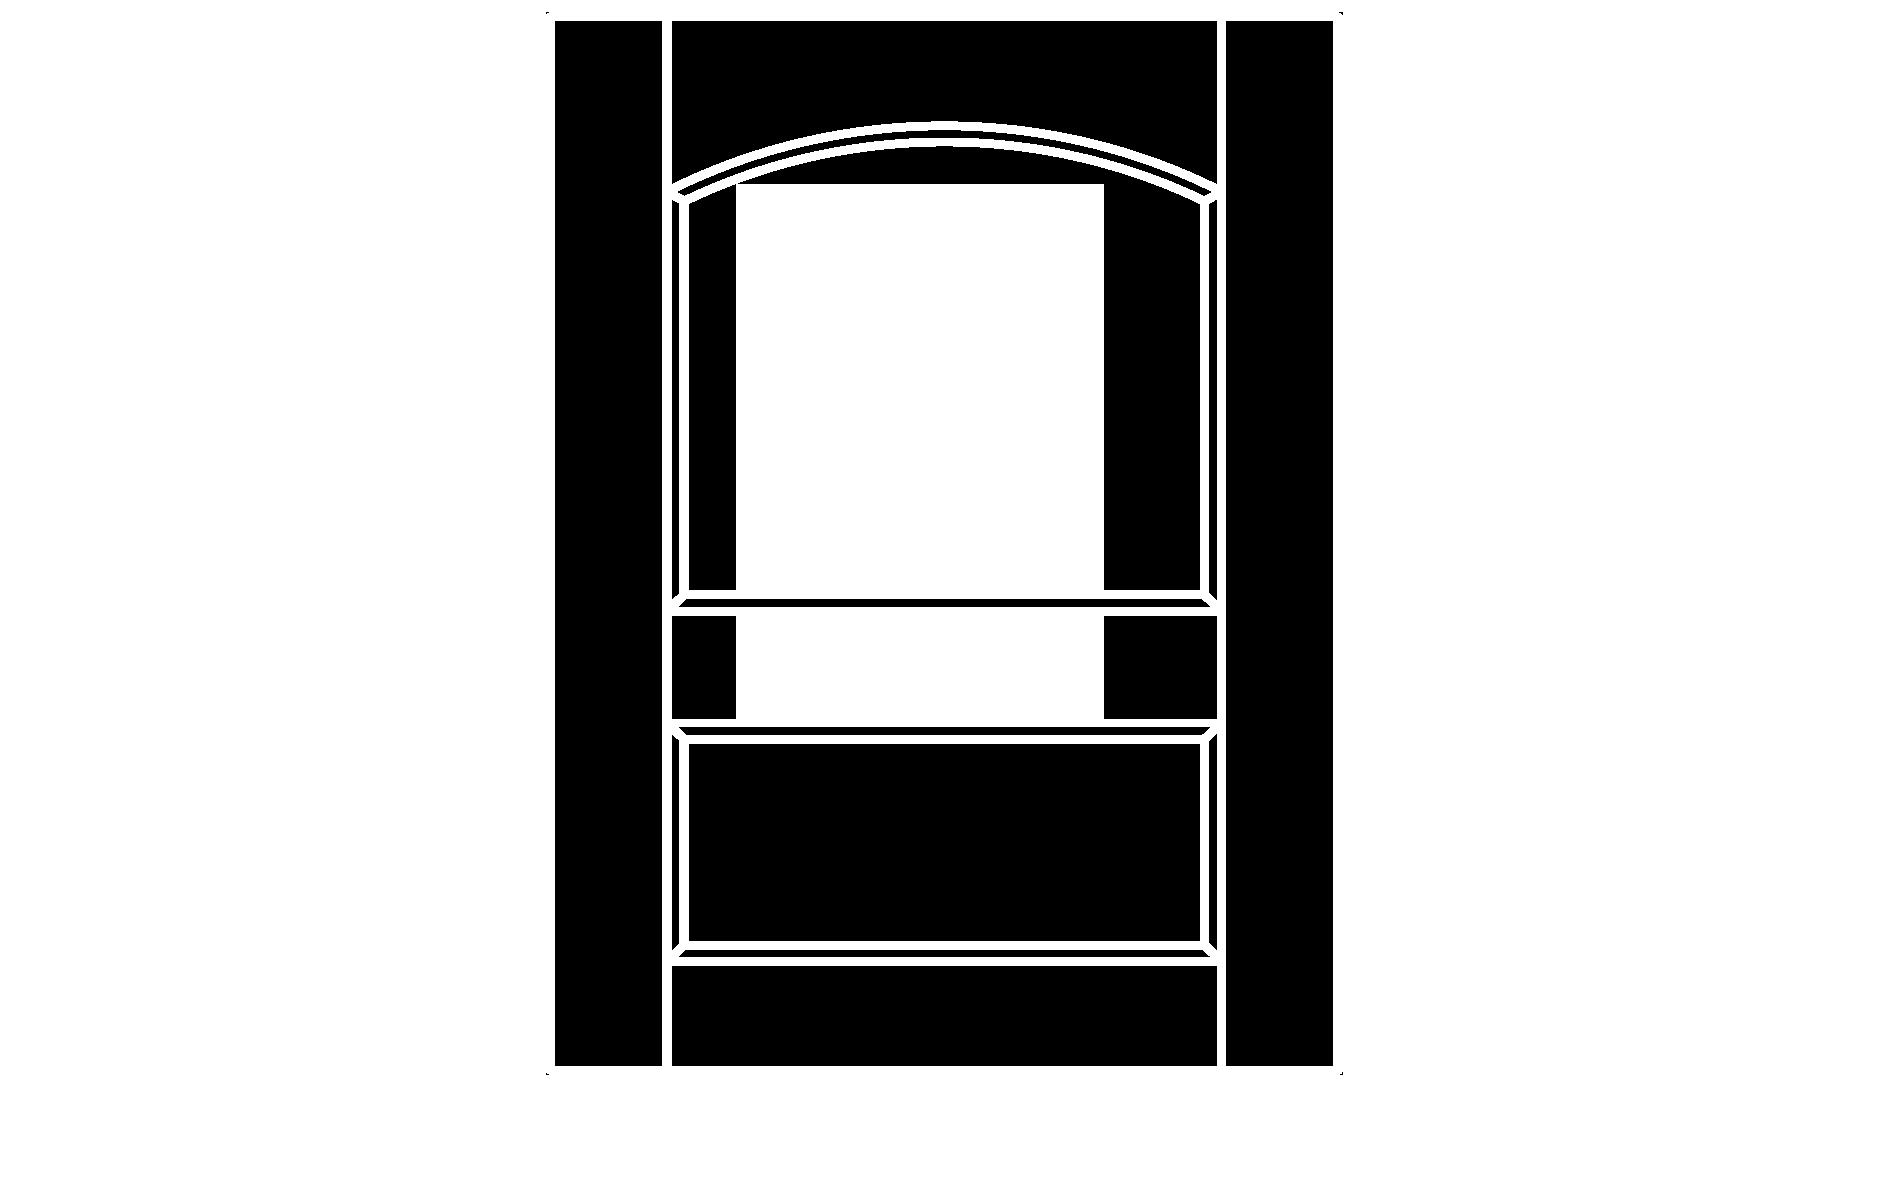 C213 cope and stick cabinet door configuration